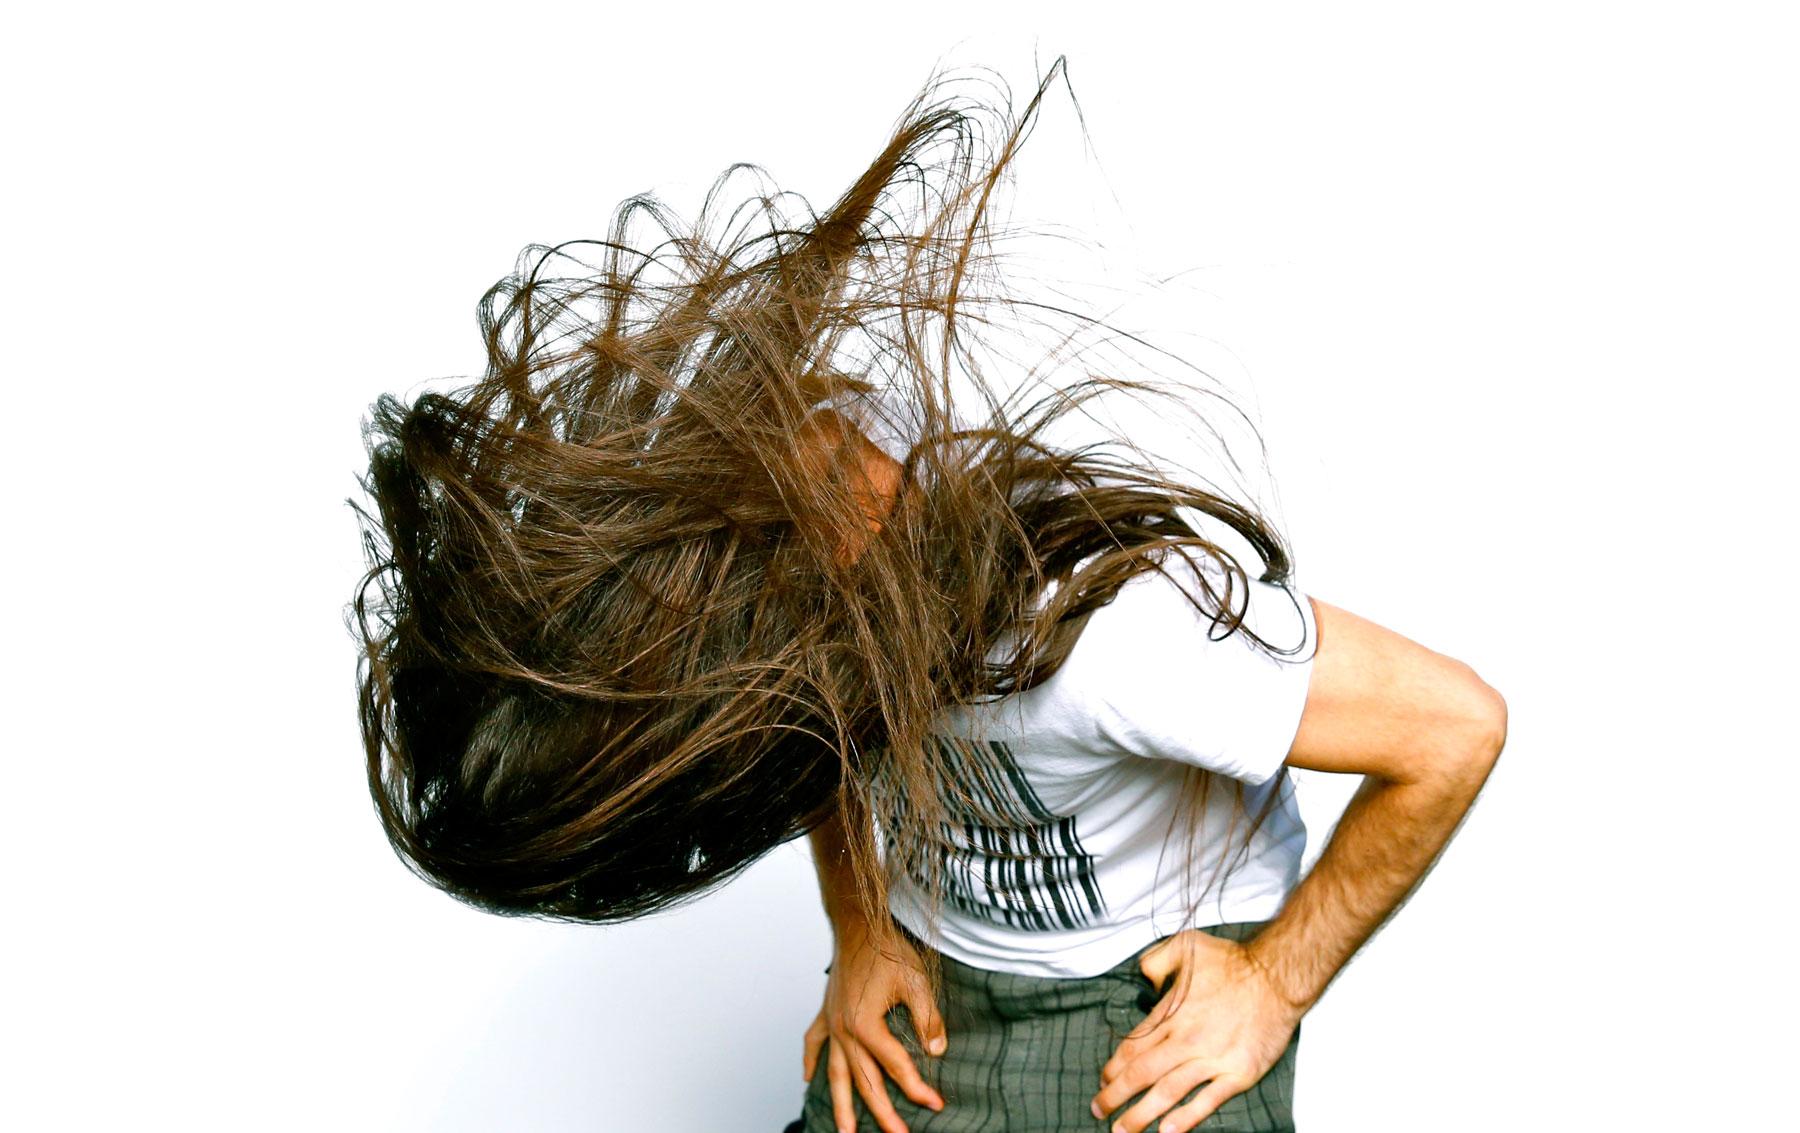 Hear Bassnectar's Daring New Album 'Noise vs. Beauty' – Premiere